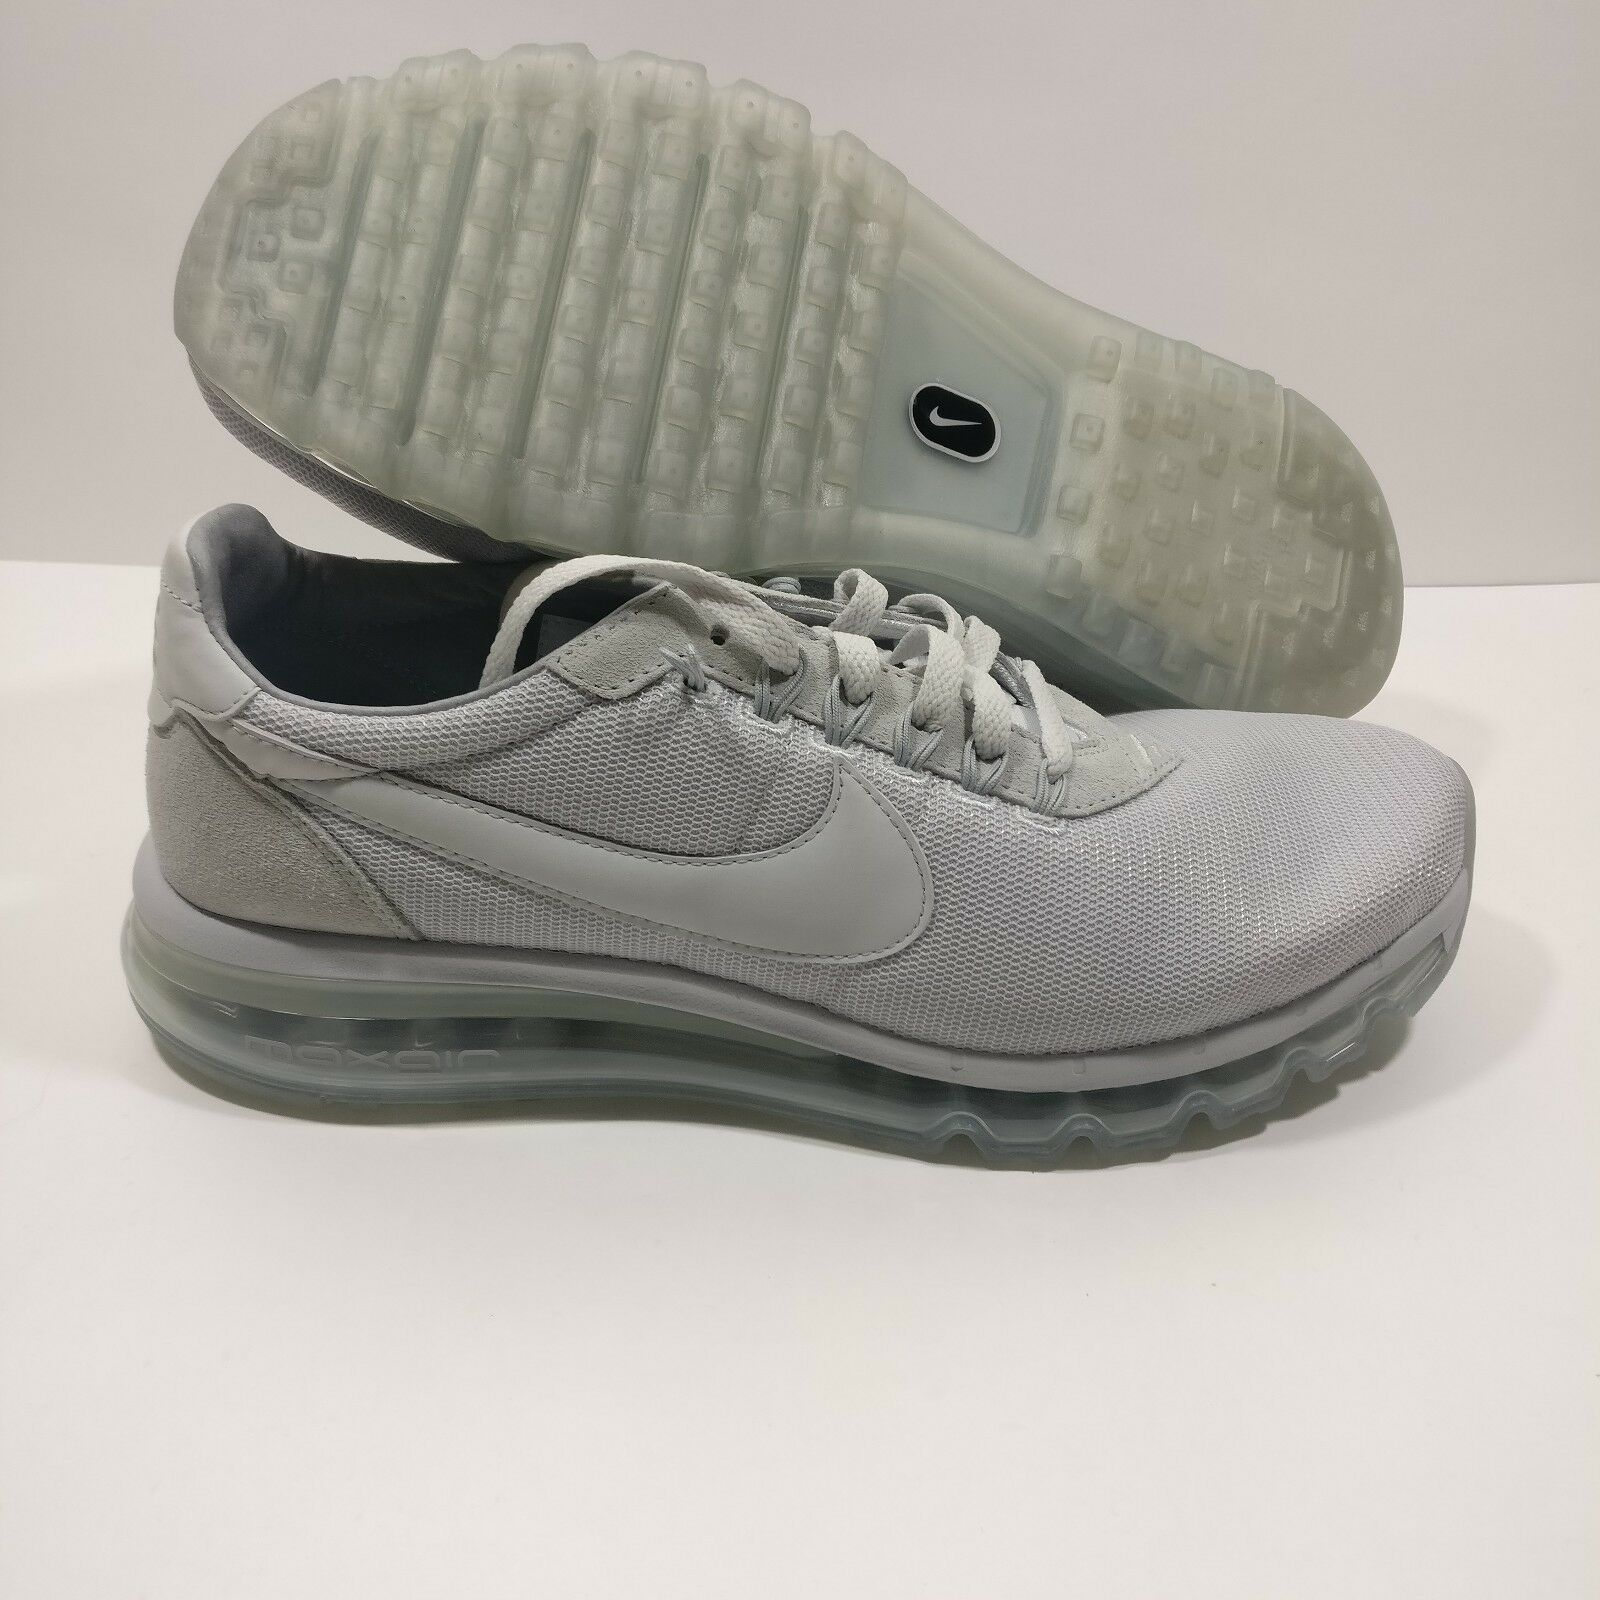 Mens Nike Air Max LD Zero Pure Platinum Grey White shoes 848624-004 Size 11.5